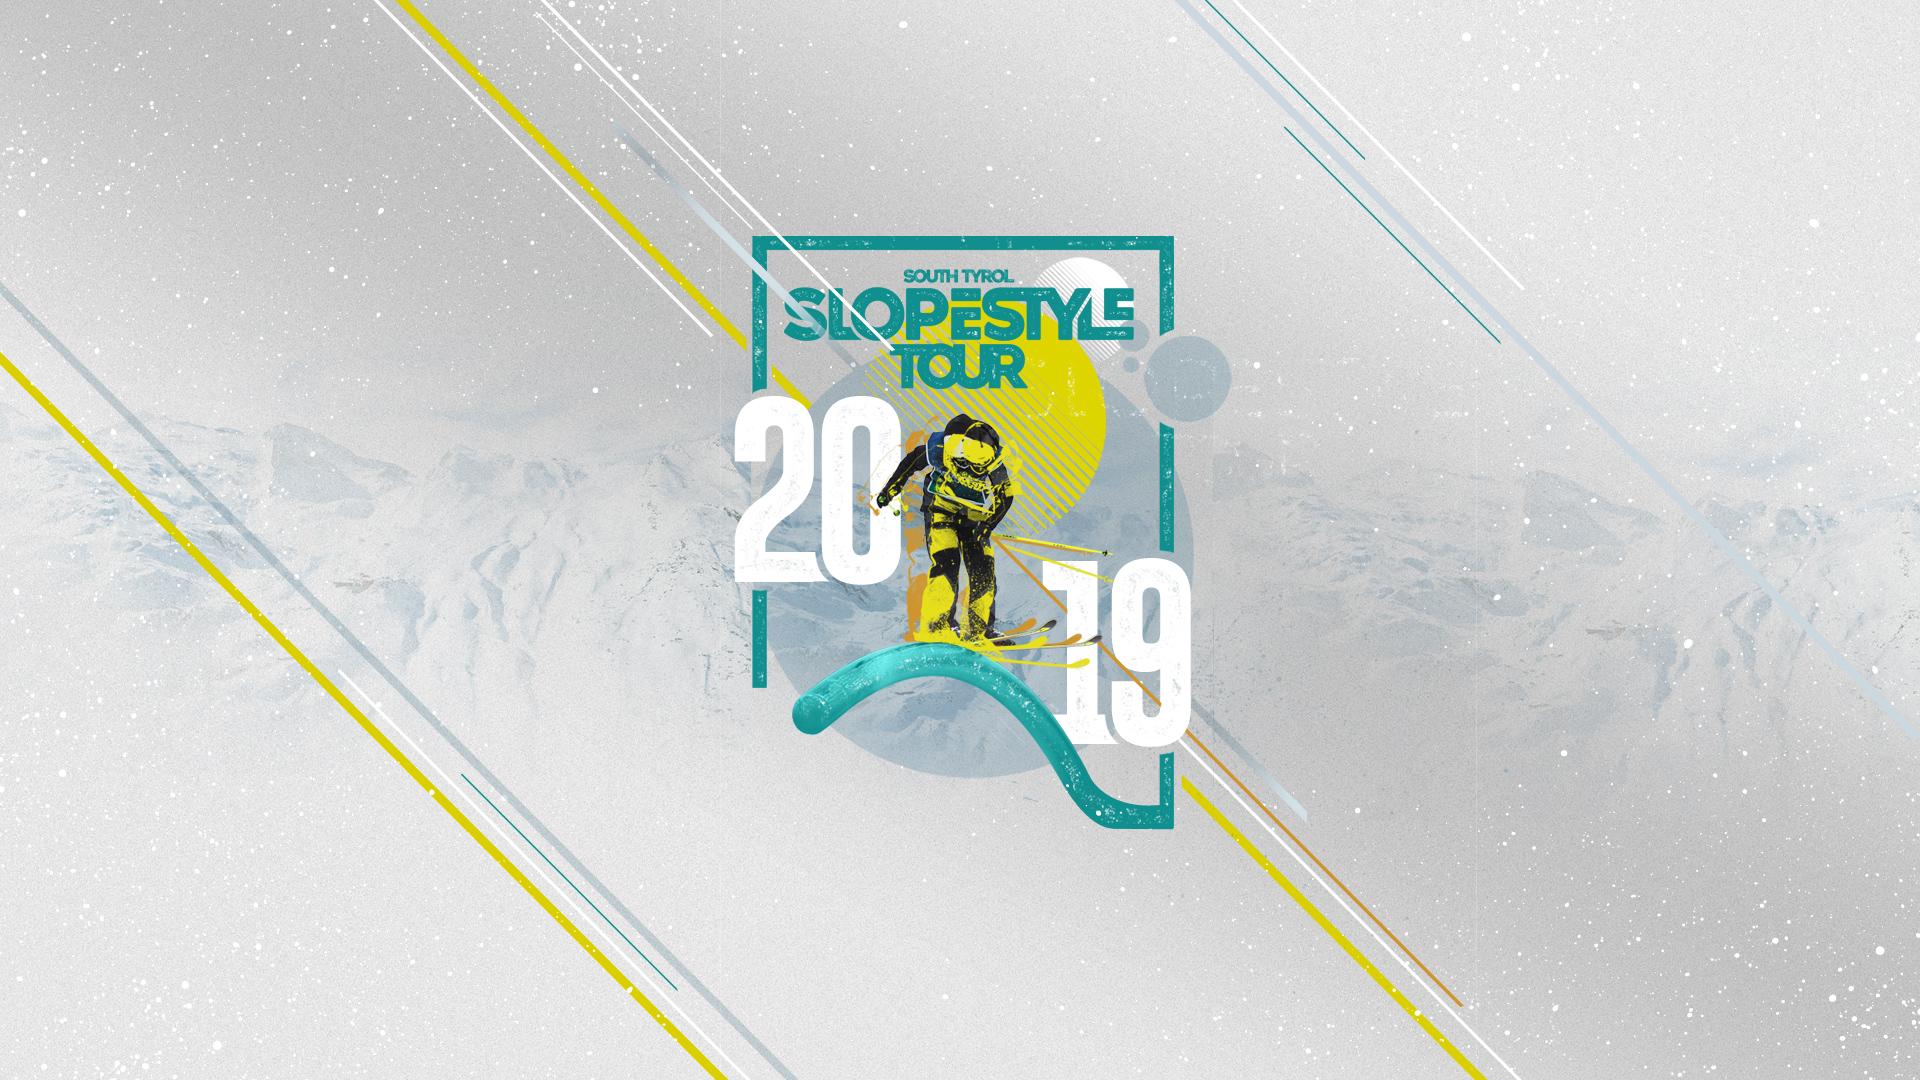 SOUTH TYROL</br>SLOPESTYLE TOUR